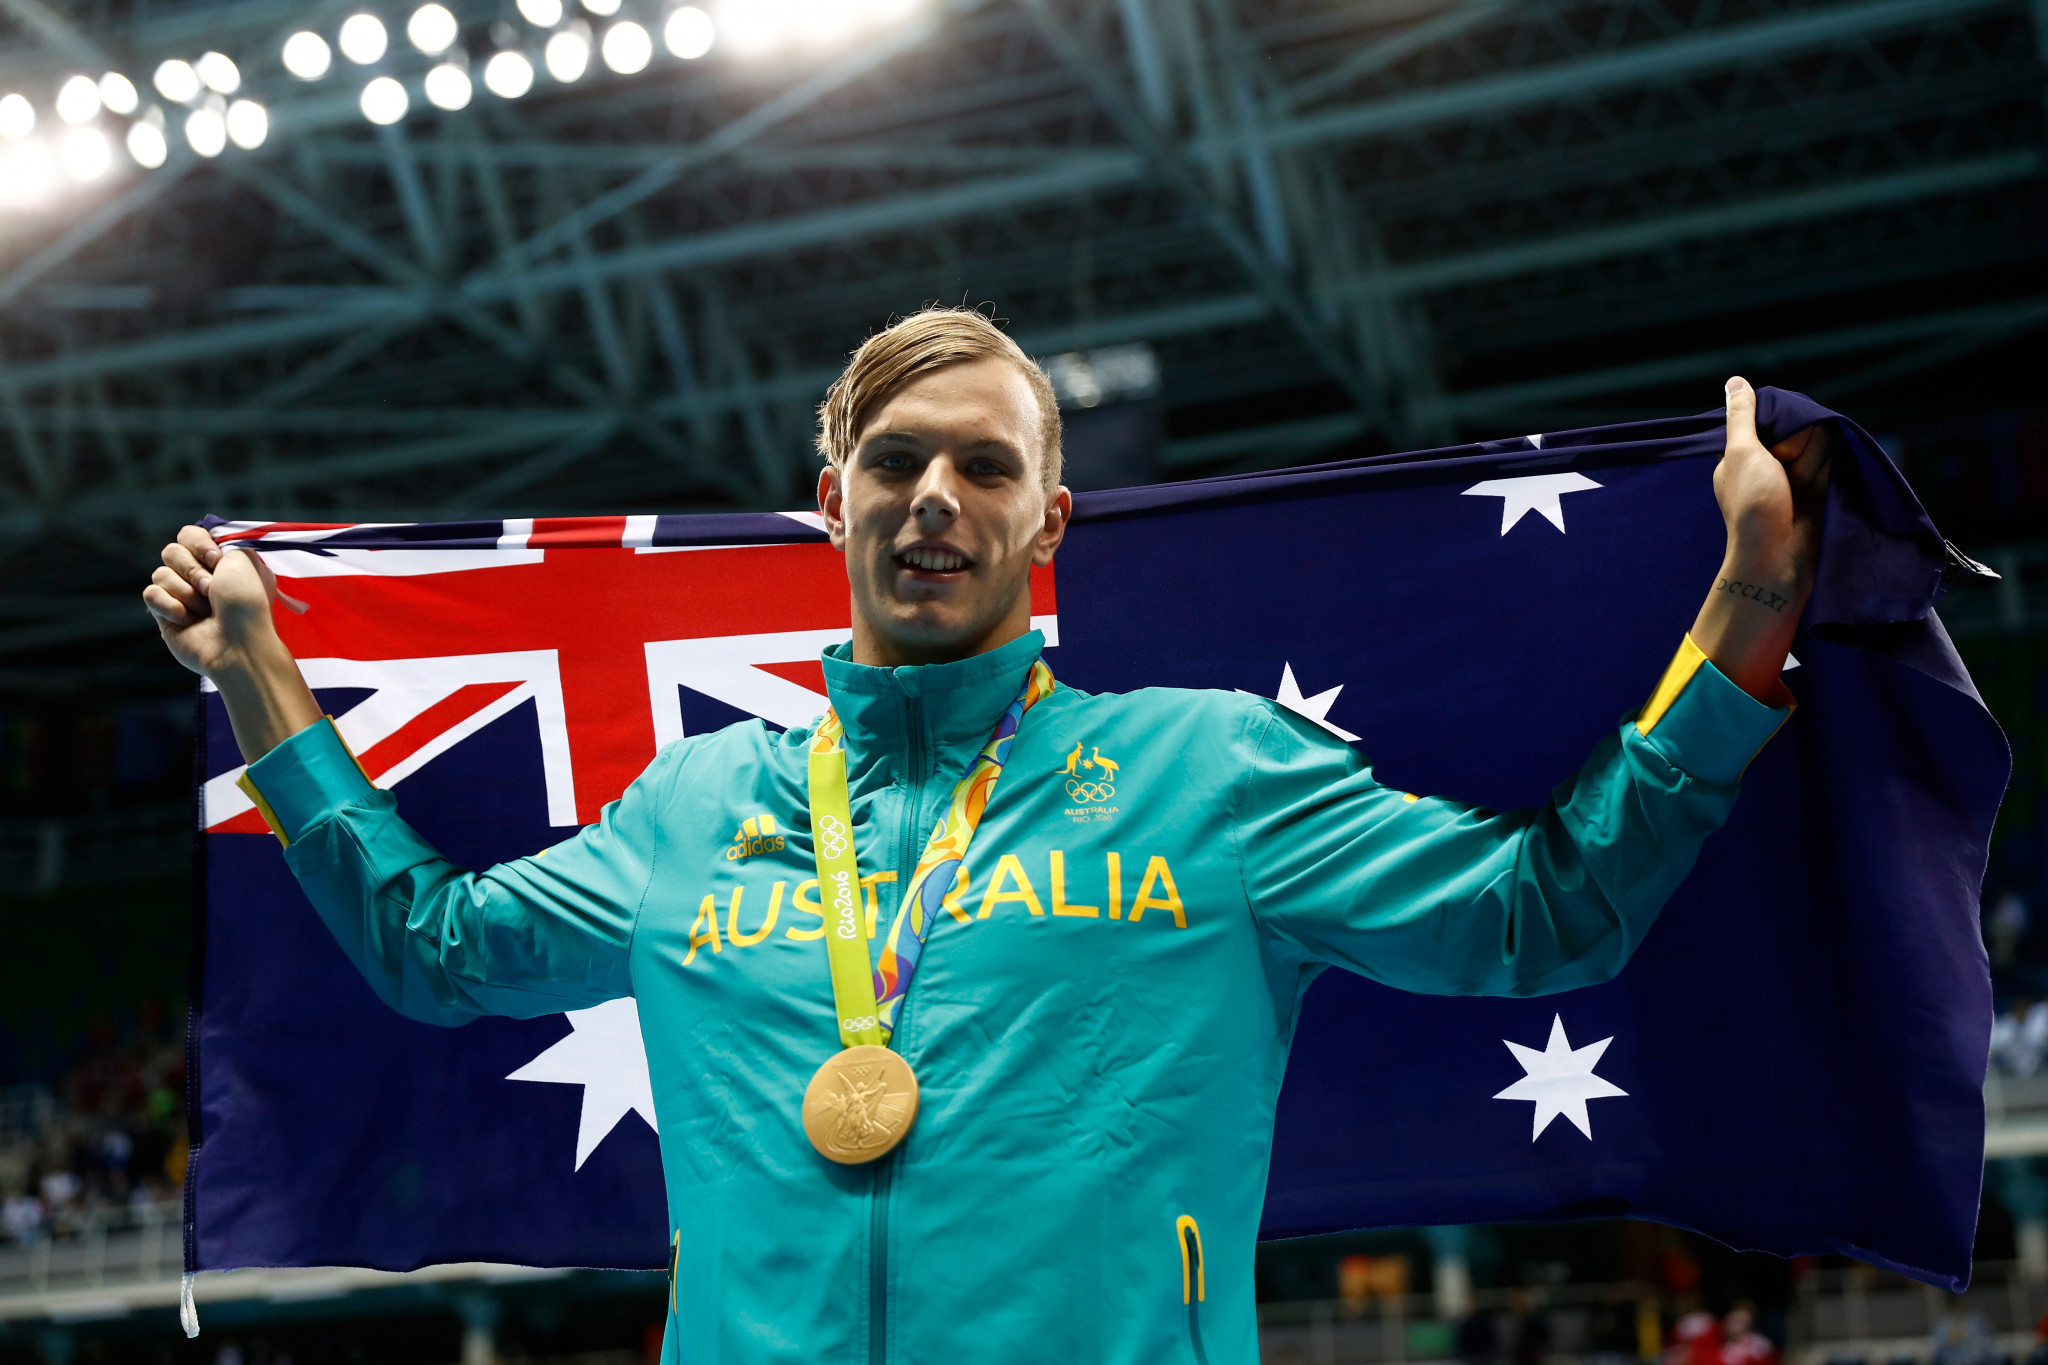 Swimmer Chalmers eyes title defence at Tokyo 2020 after shoulder surgery